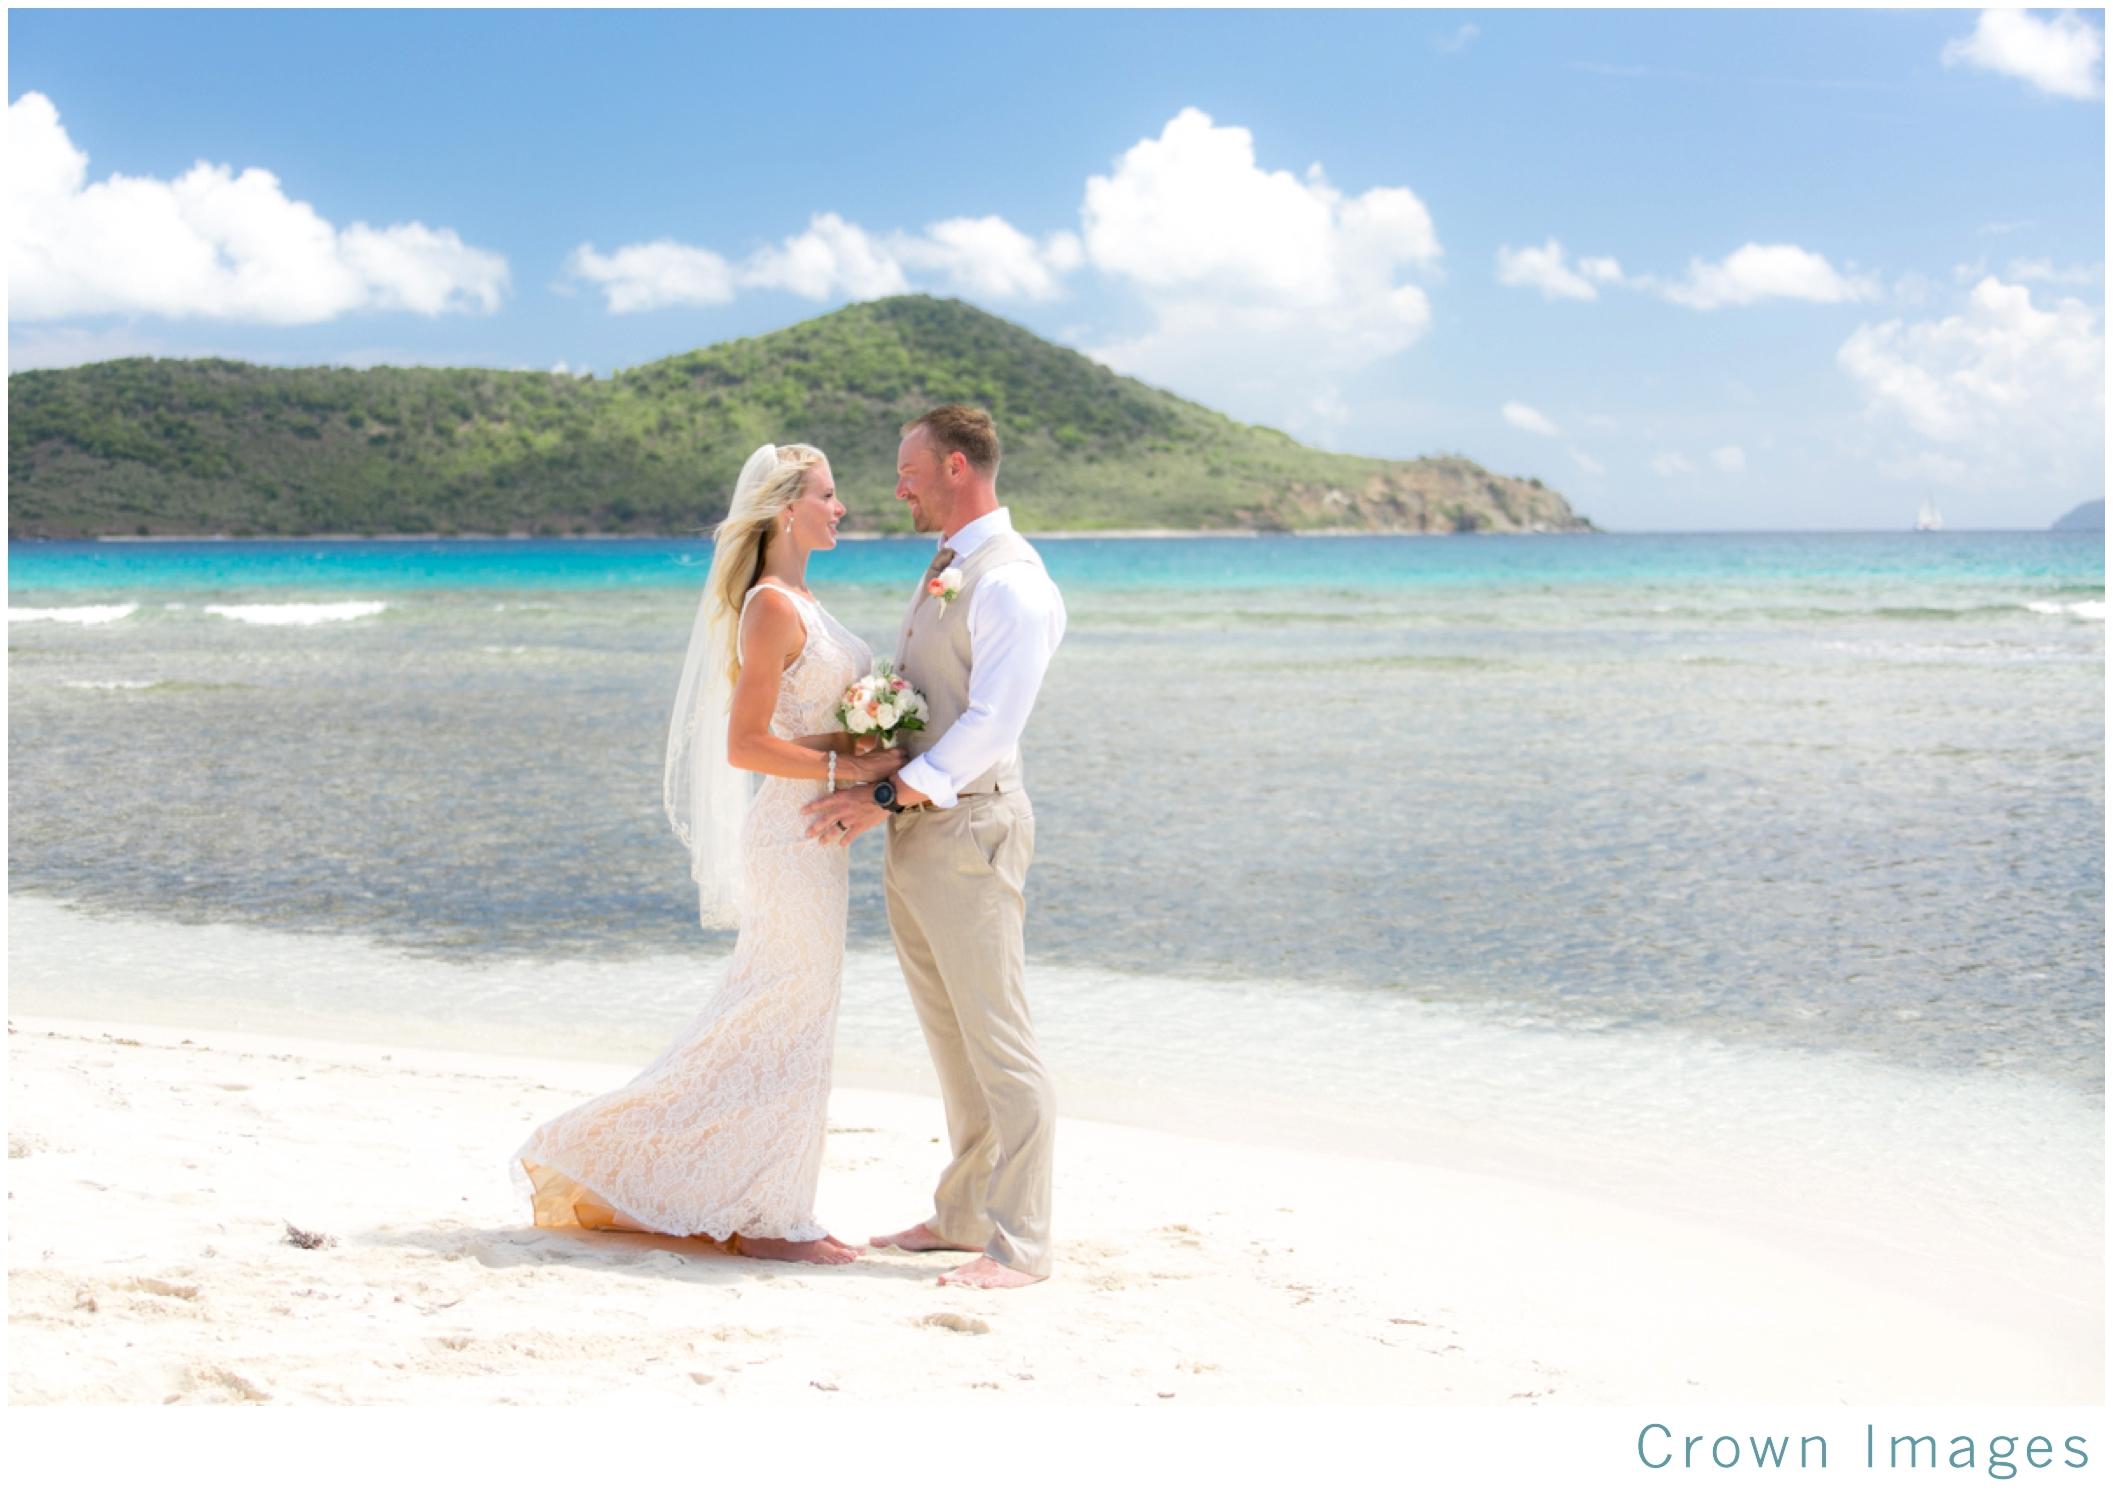 beach-wedding-st-thomas-virgin-islands-_1941.jpg